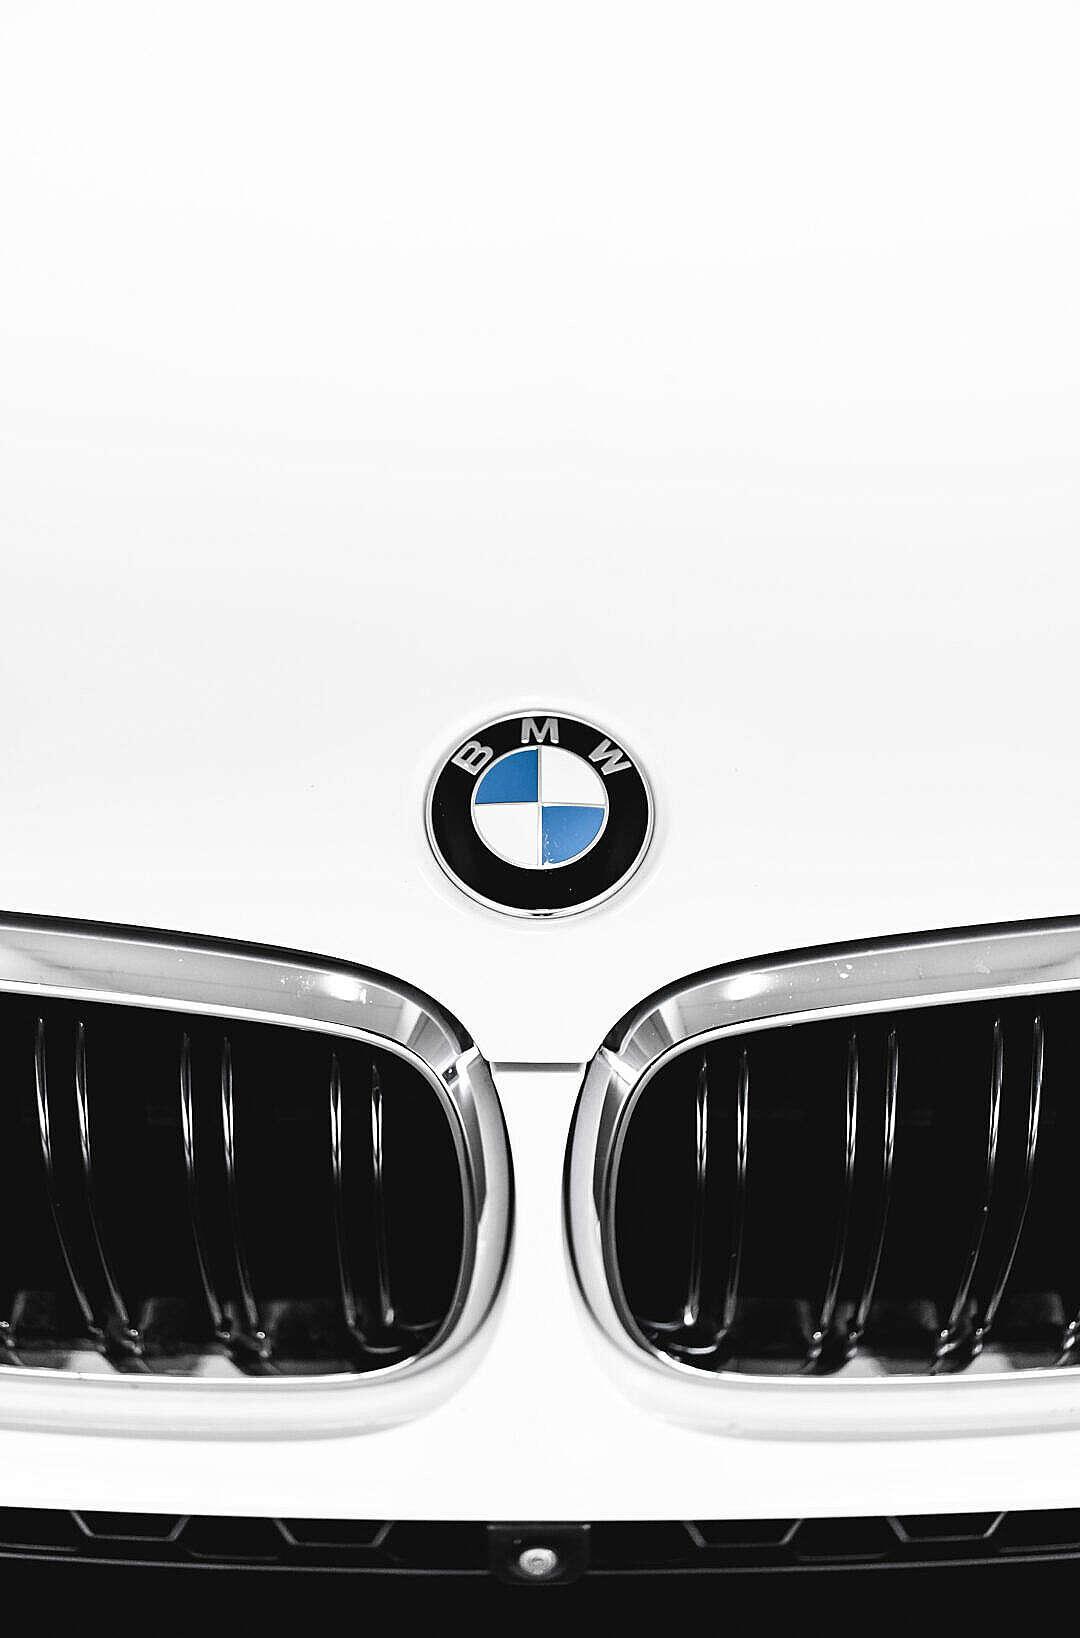 Download BMW Car Bonnet Badge FREE Stock Photo